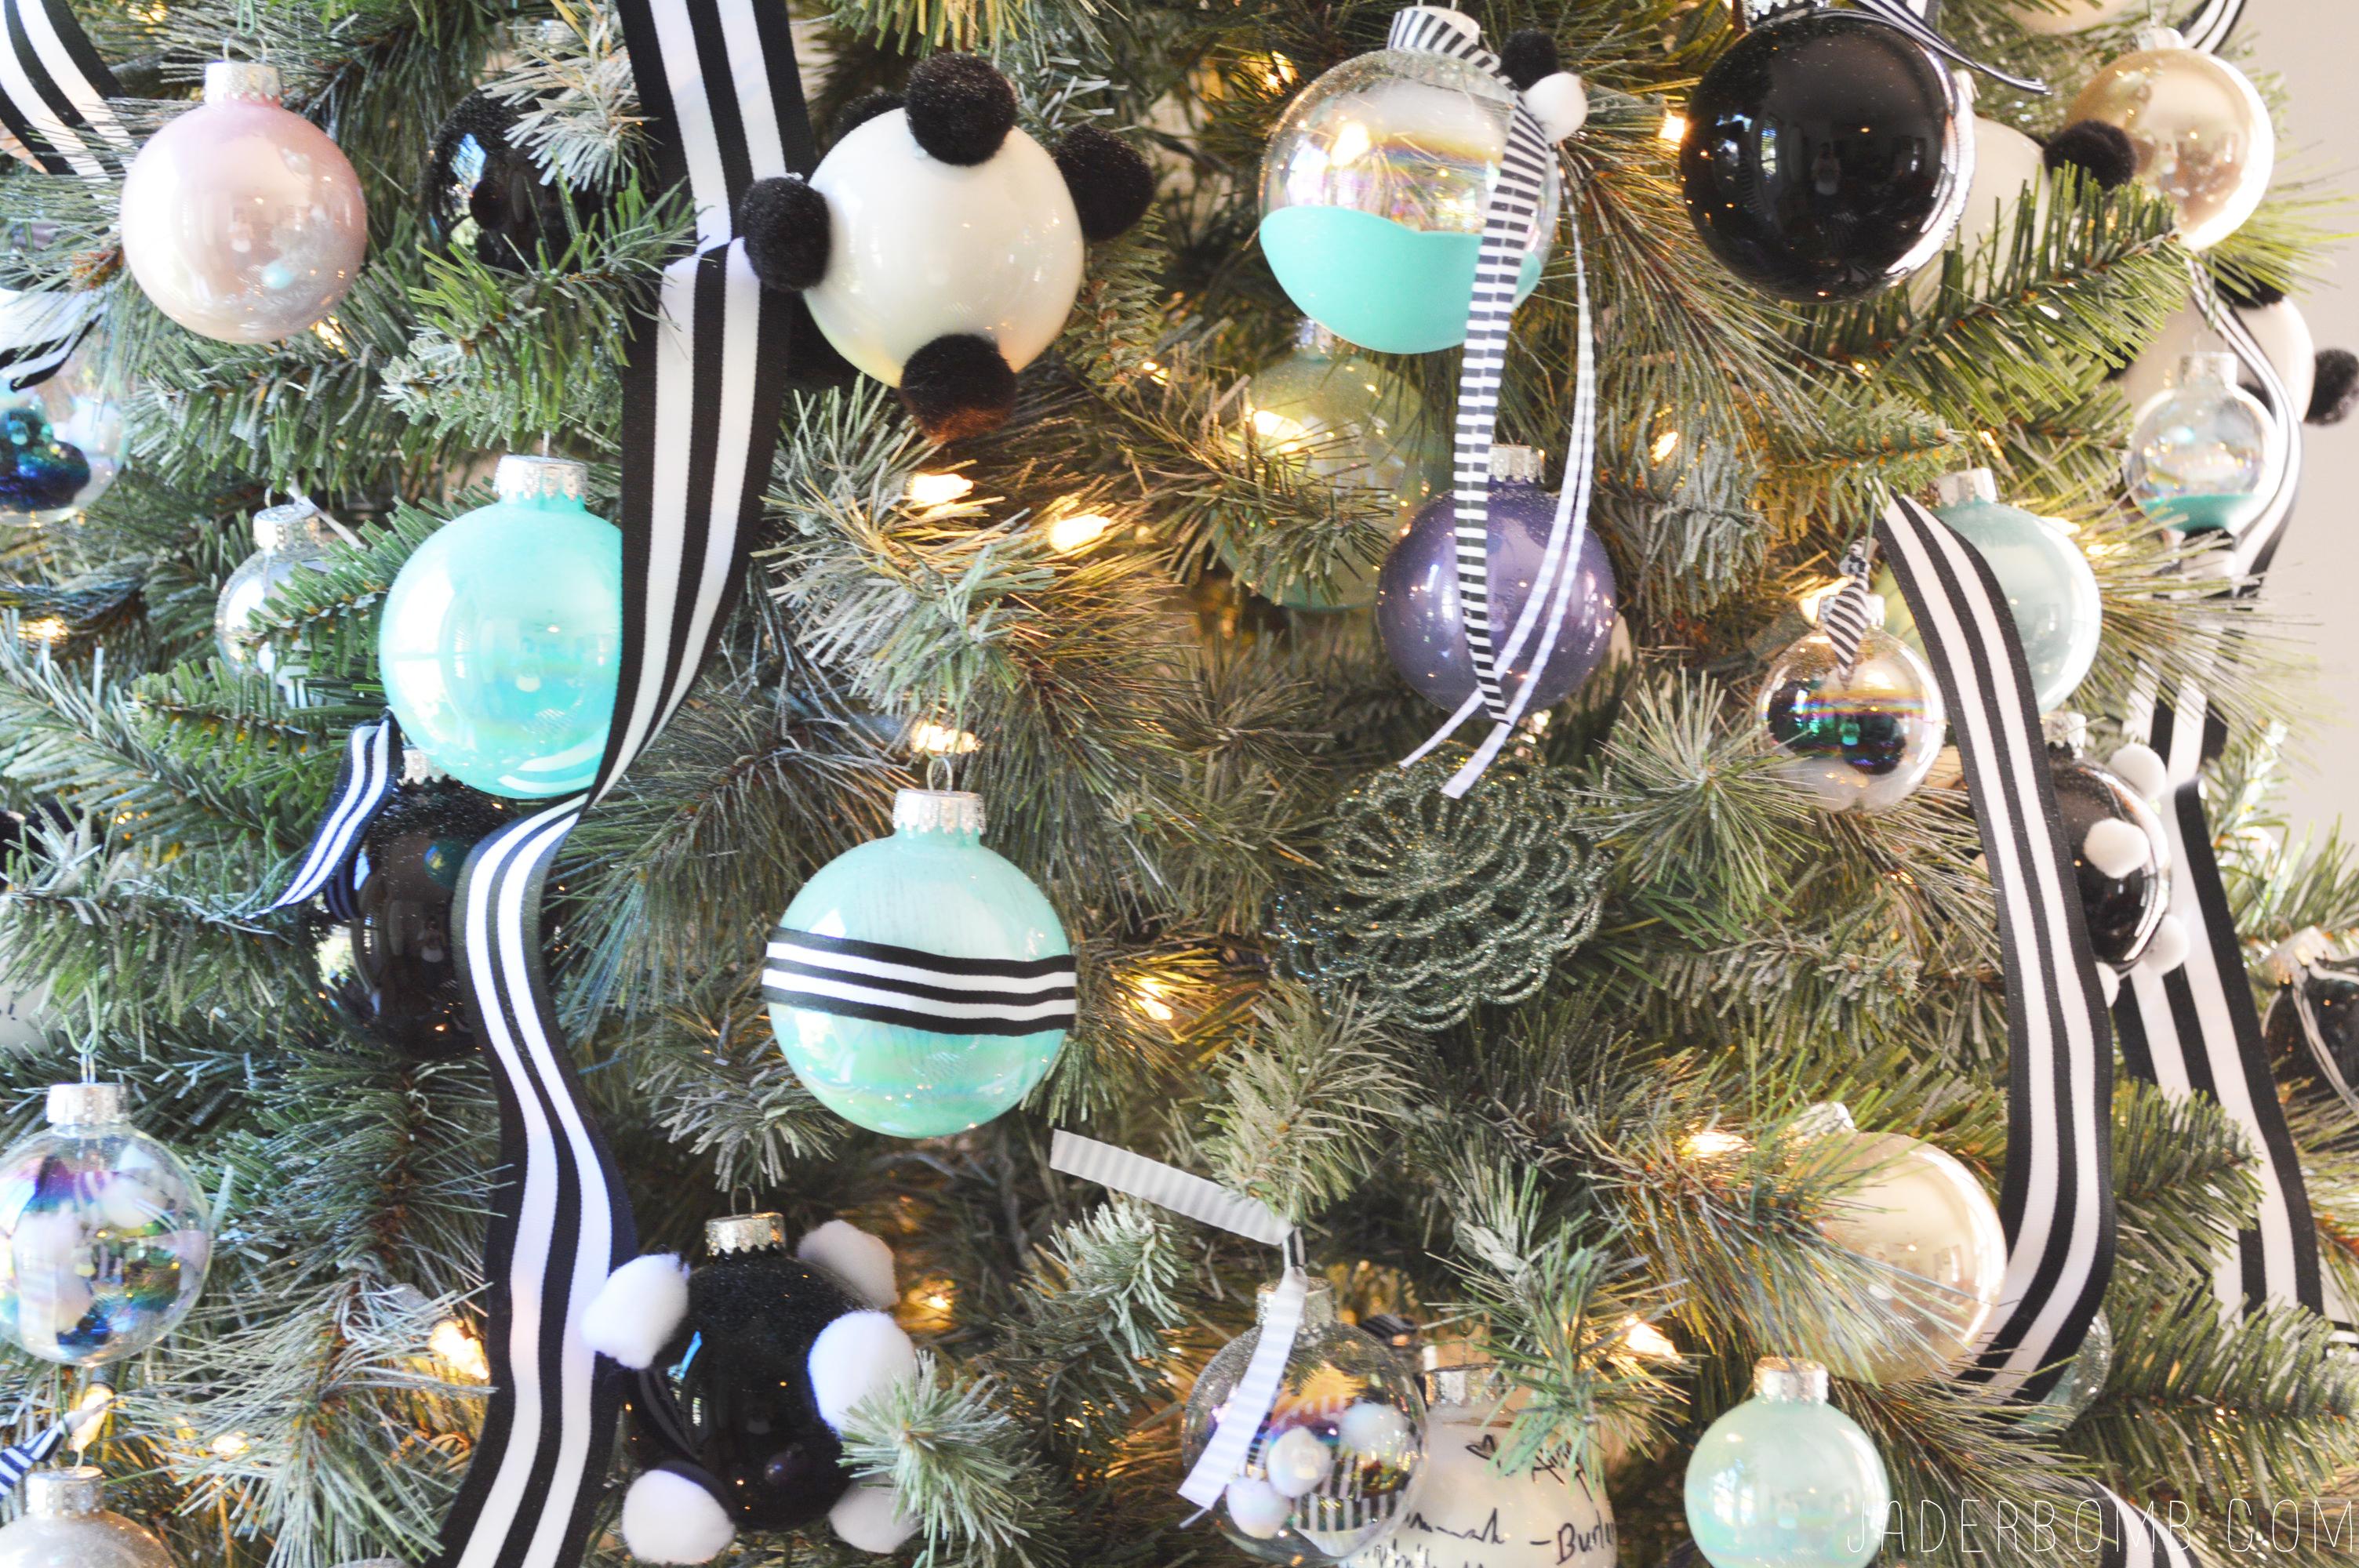 MICHAELS CHRISTMAS TREE REVEAL